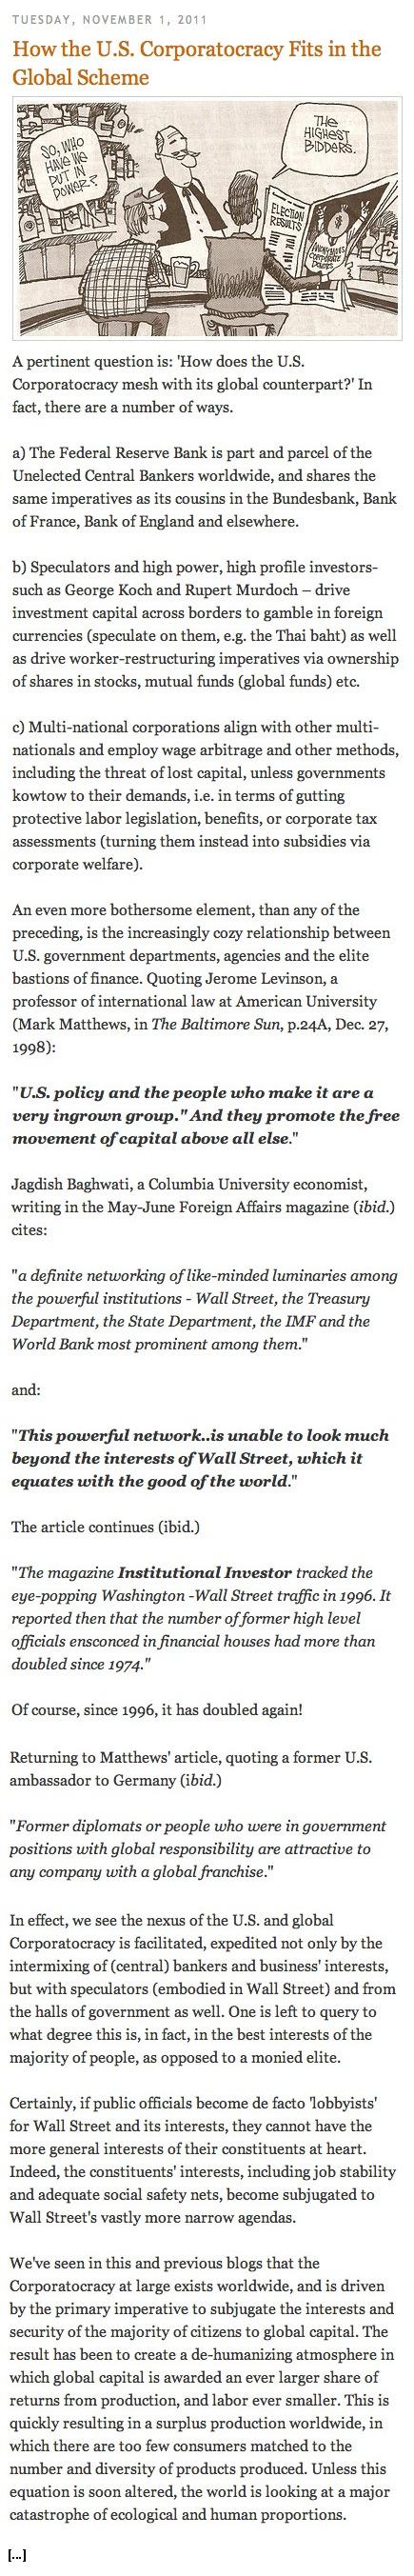 Global Corporatocracy